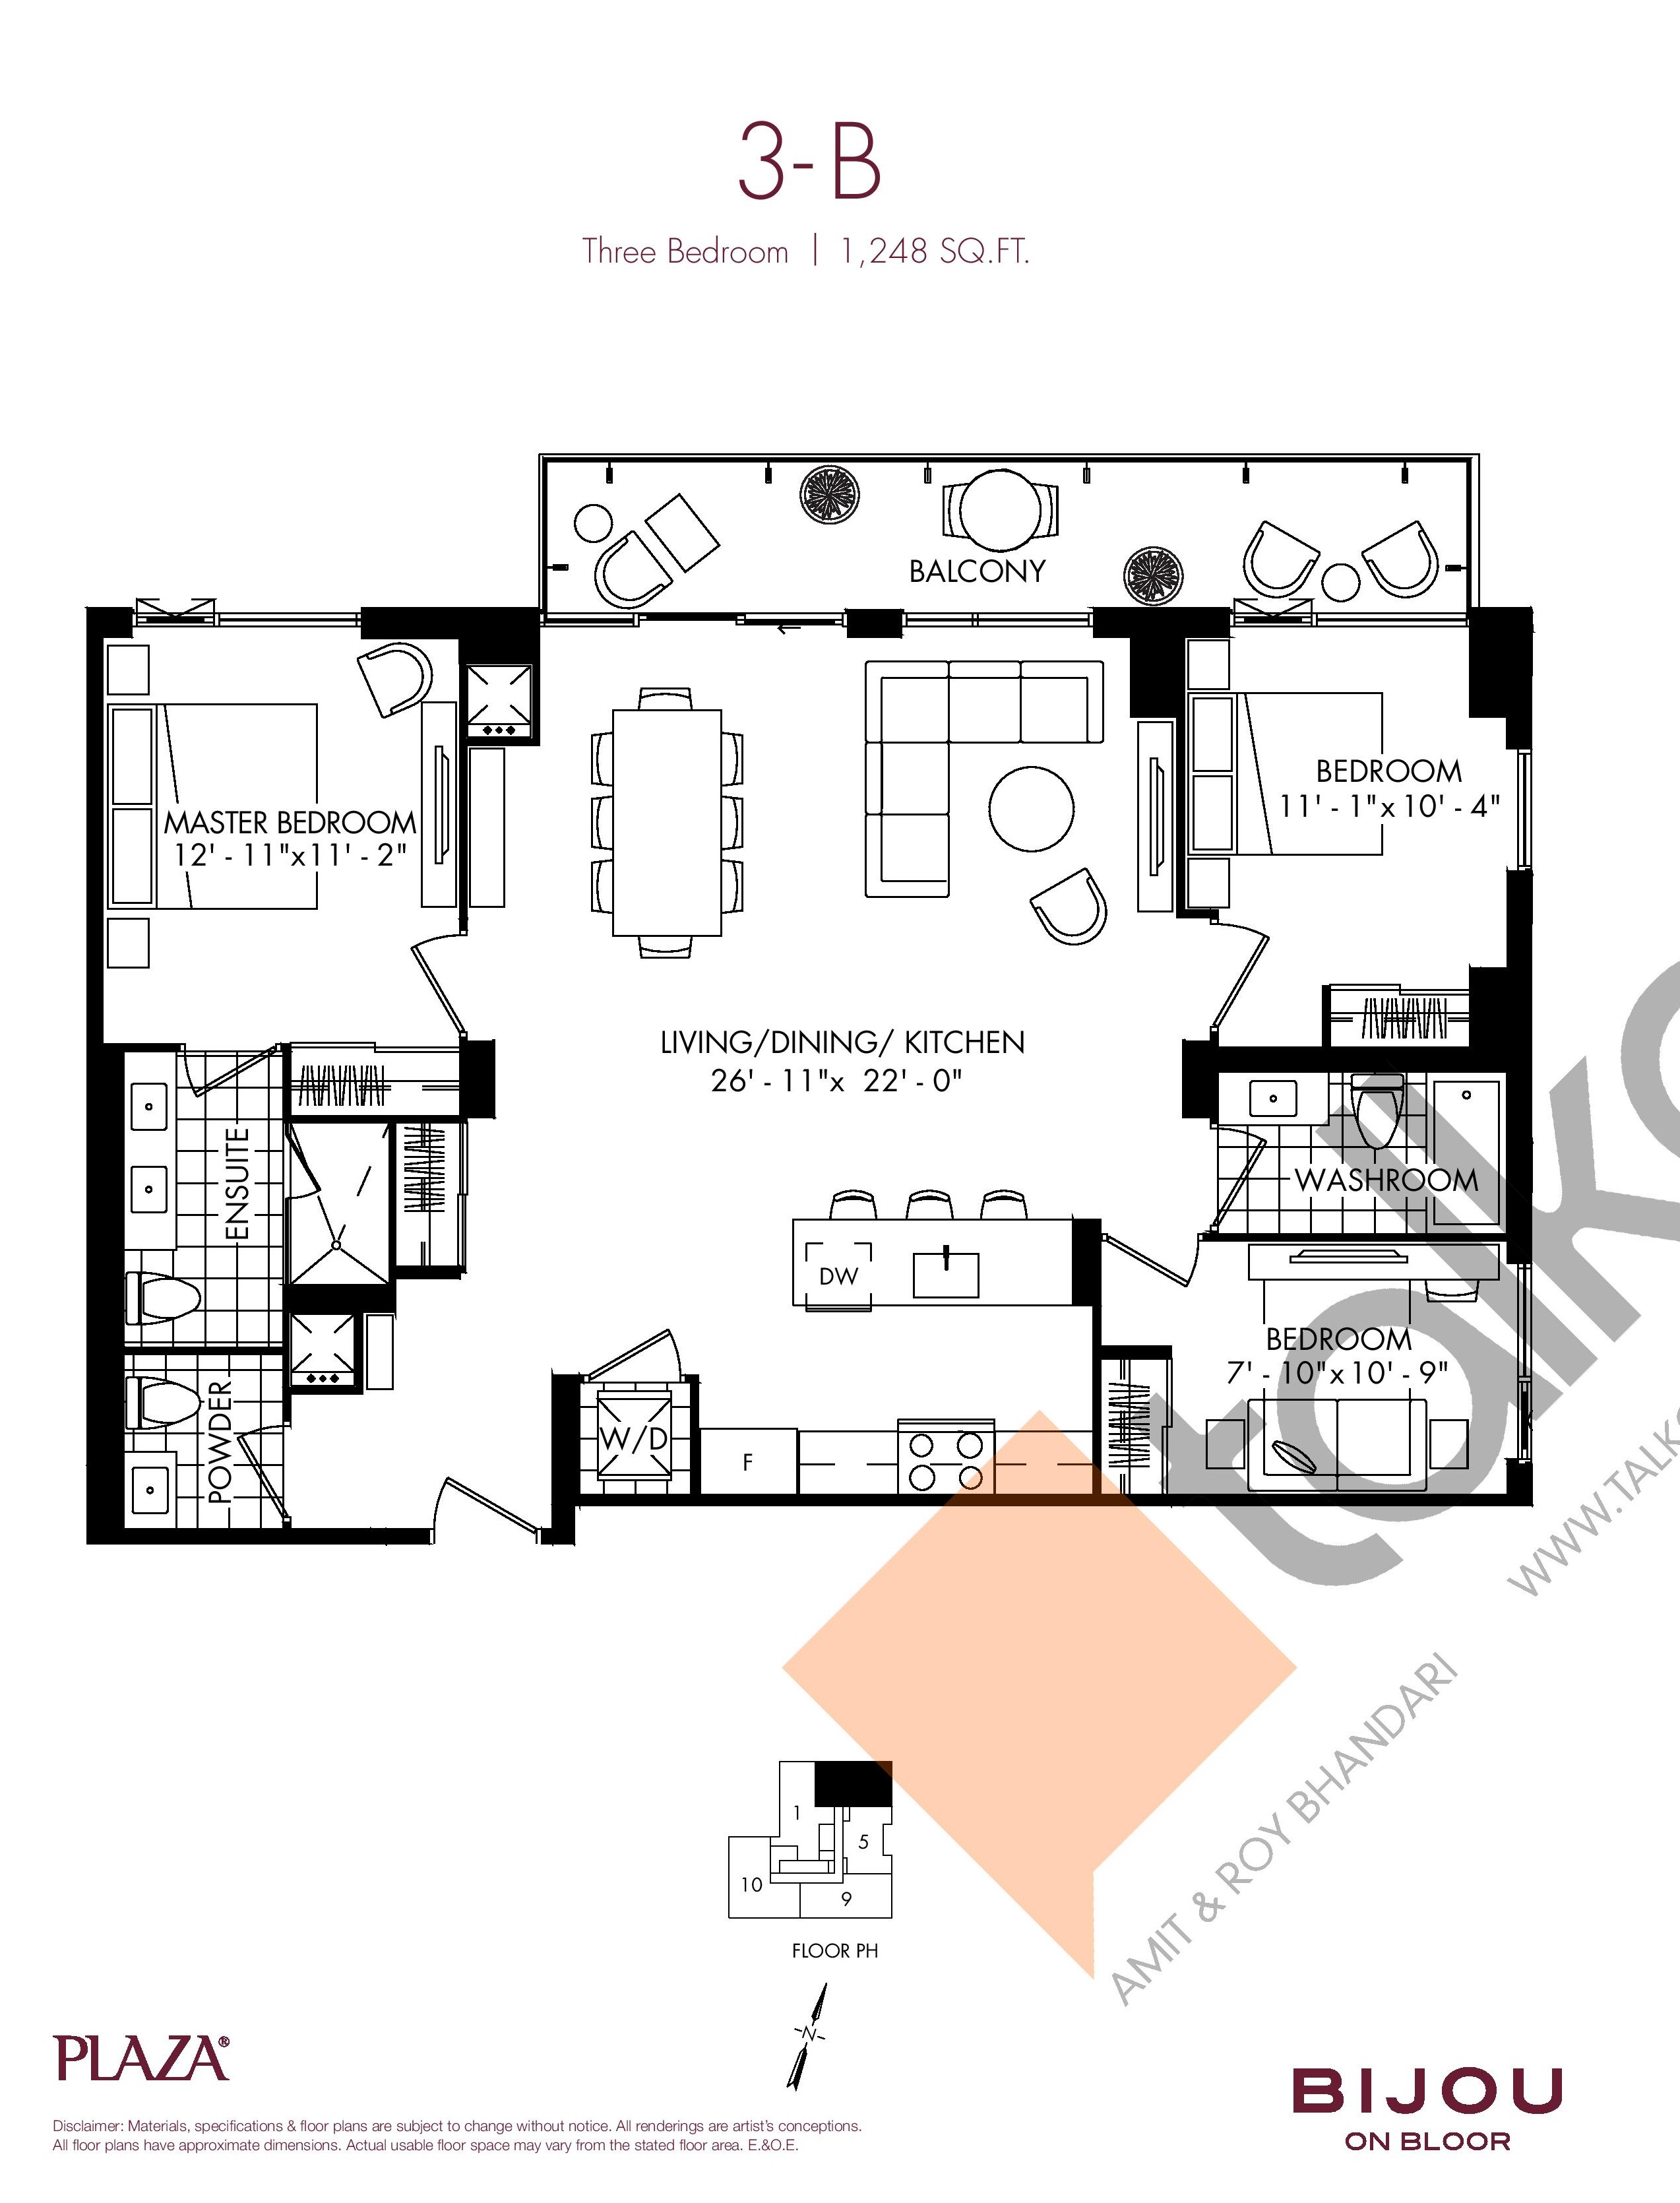 Suite 3-B Floor Plan at Bijou On Bloor Condos - 1248 sq.ft